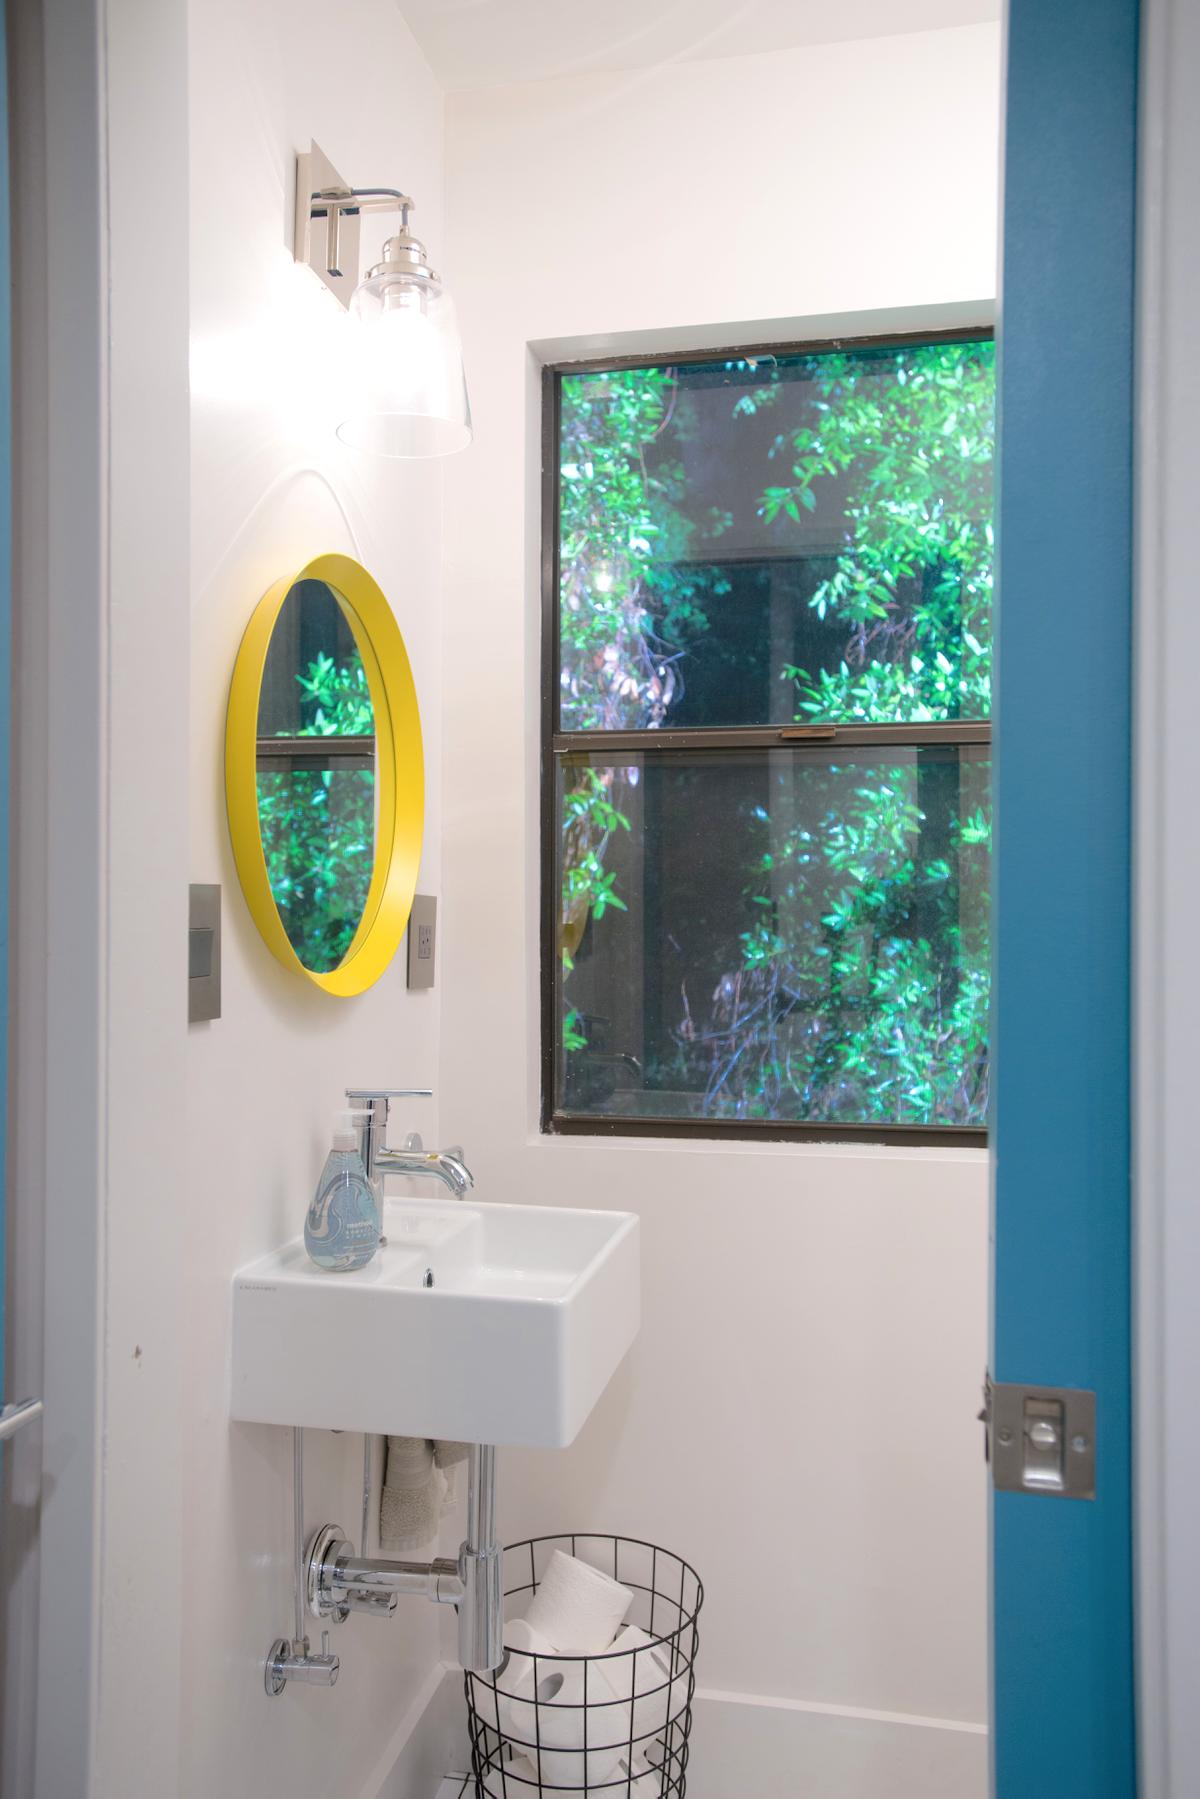 Magnificent 10 Master Bathroom No Window Design Inspiration Of Mobilier De Baie Cu Oglinzi